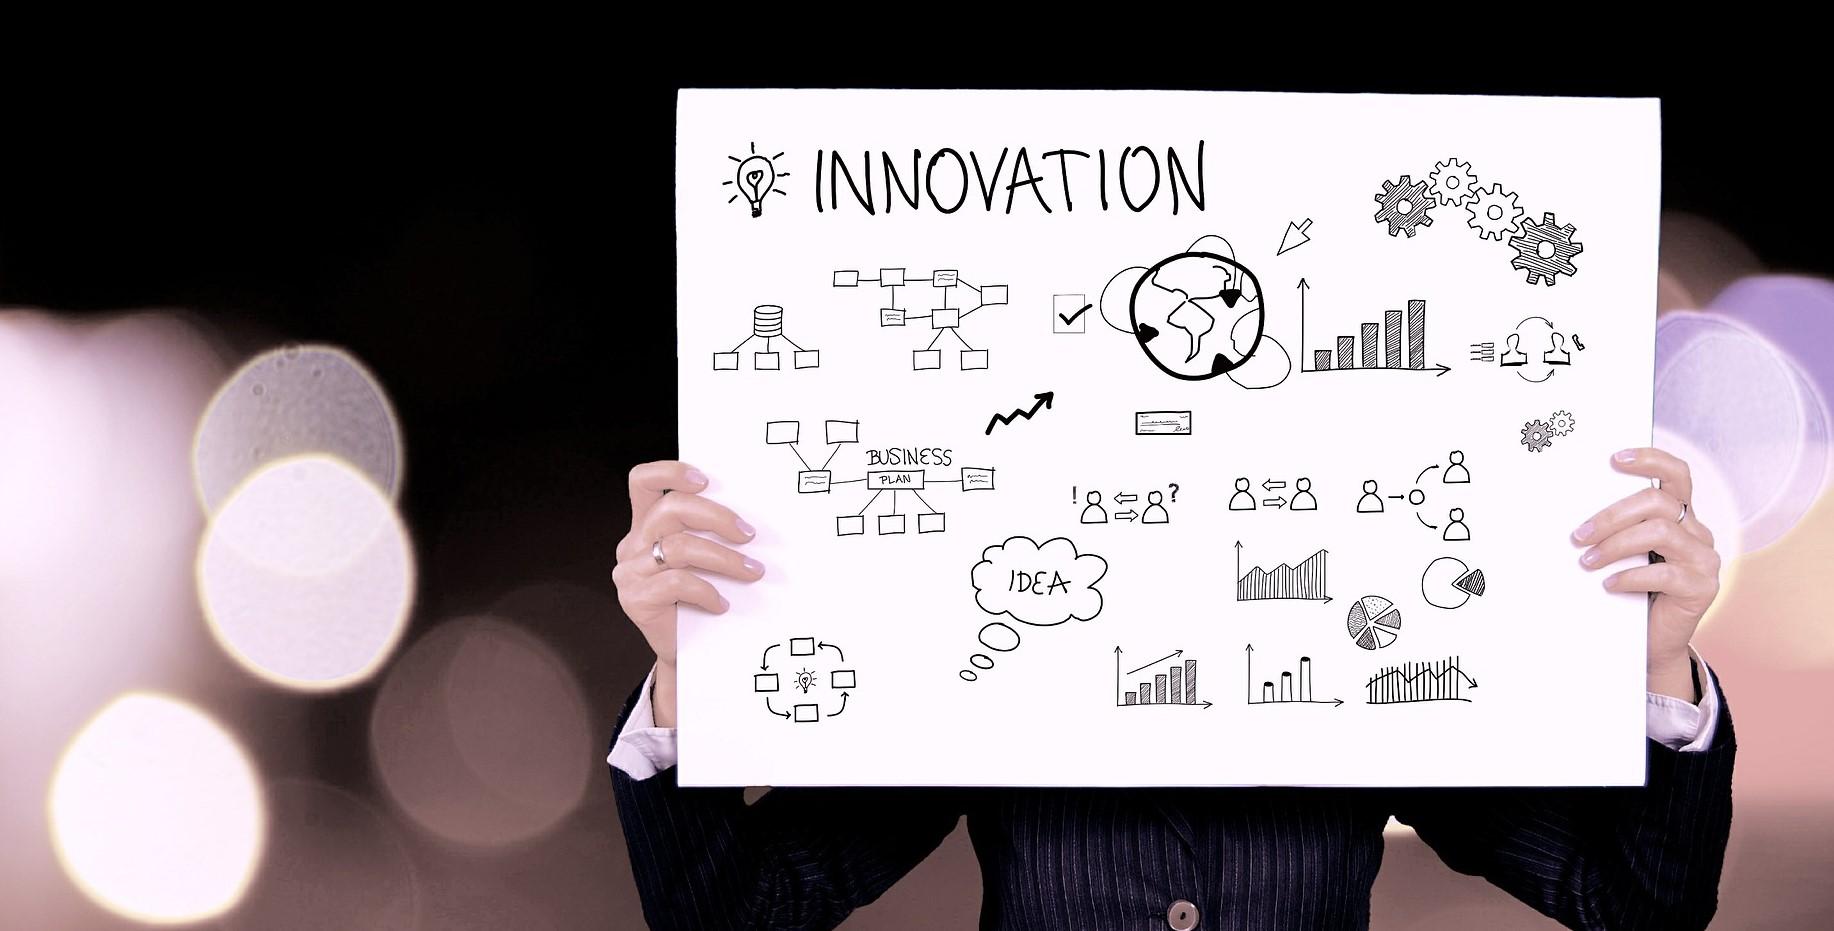 Programme «Imtiaz Technologies Covid-19»: 34 projets approuvés